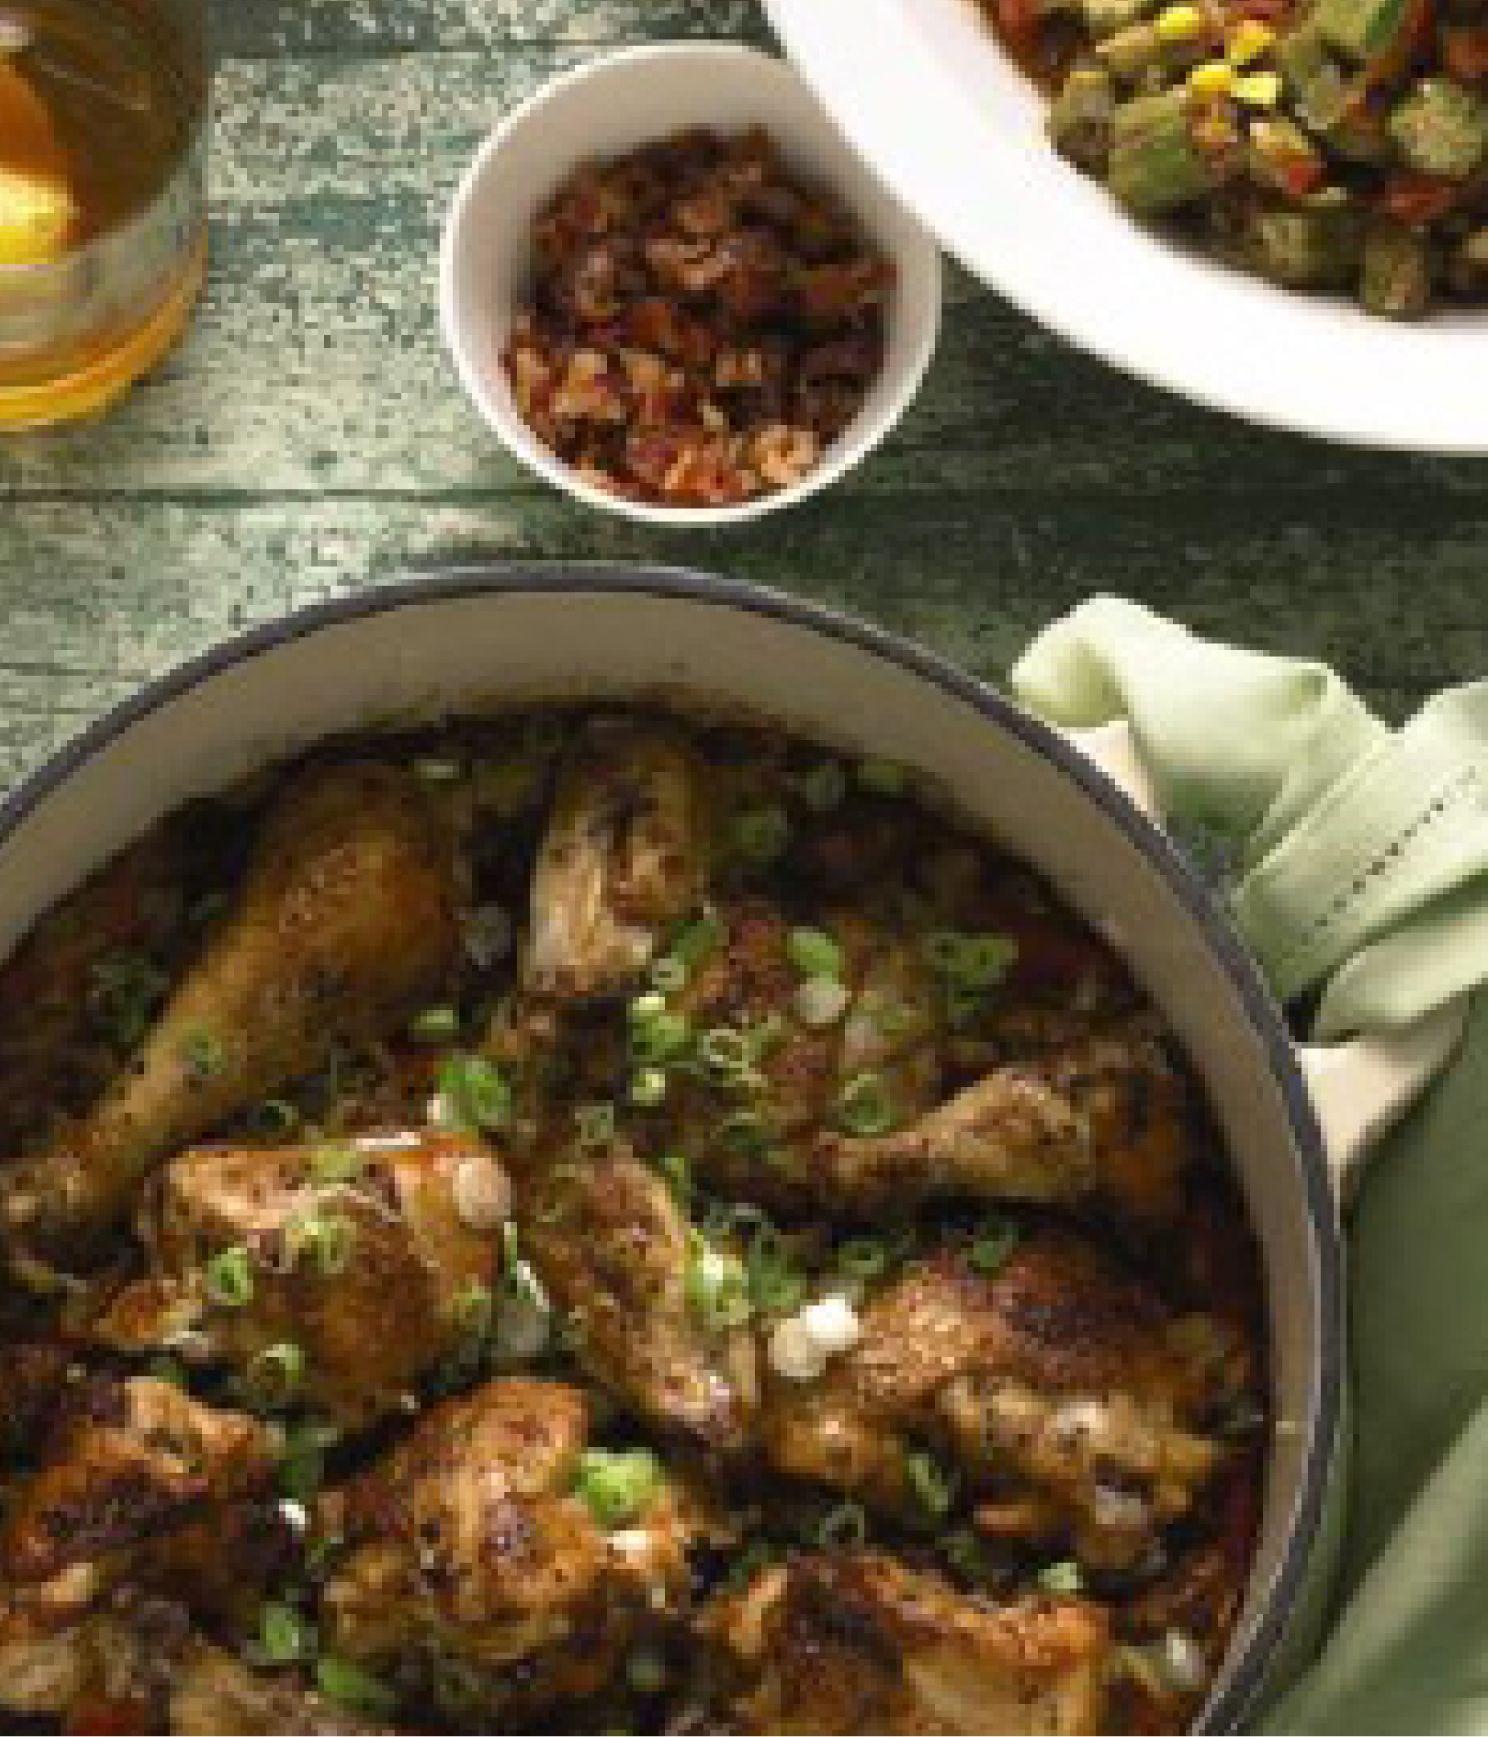 Get the recipe classic chicken jambalaya by mcc chef emeril lagasse get the recipe classic chicken jambalaya by mcc chef emeril lagasse macys recipe forumfinder Gallery